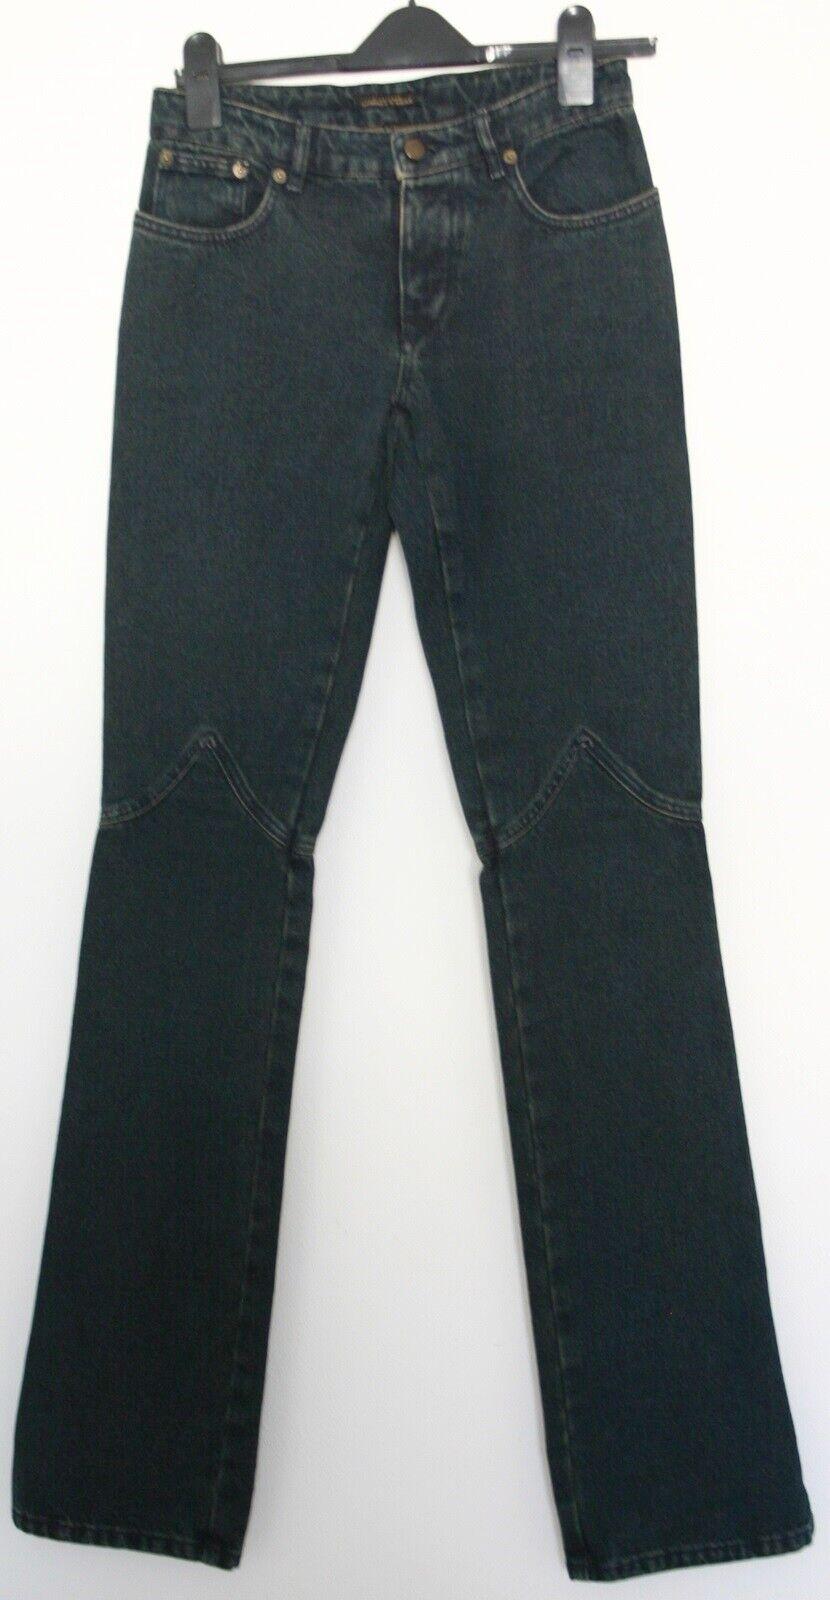 DONNA STRENESSE Pantaloni Jeans Blu Wash Out Taglia 34